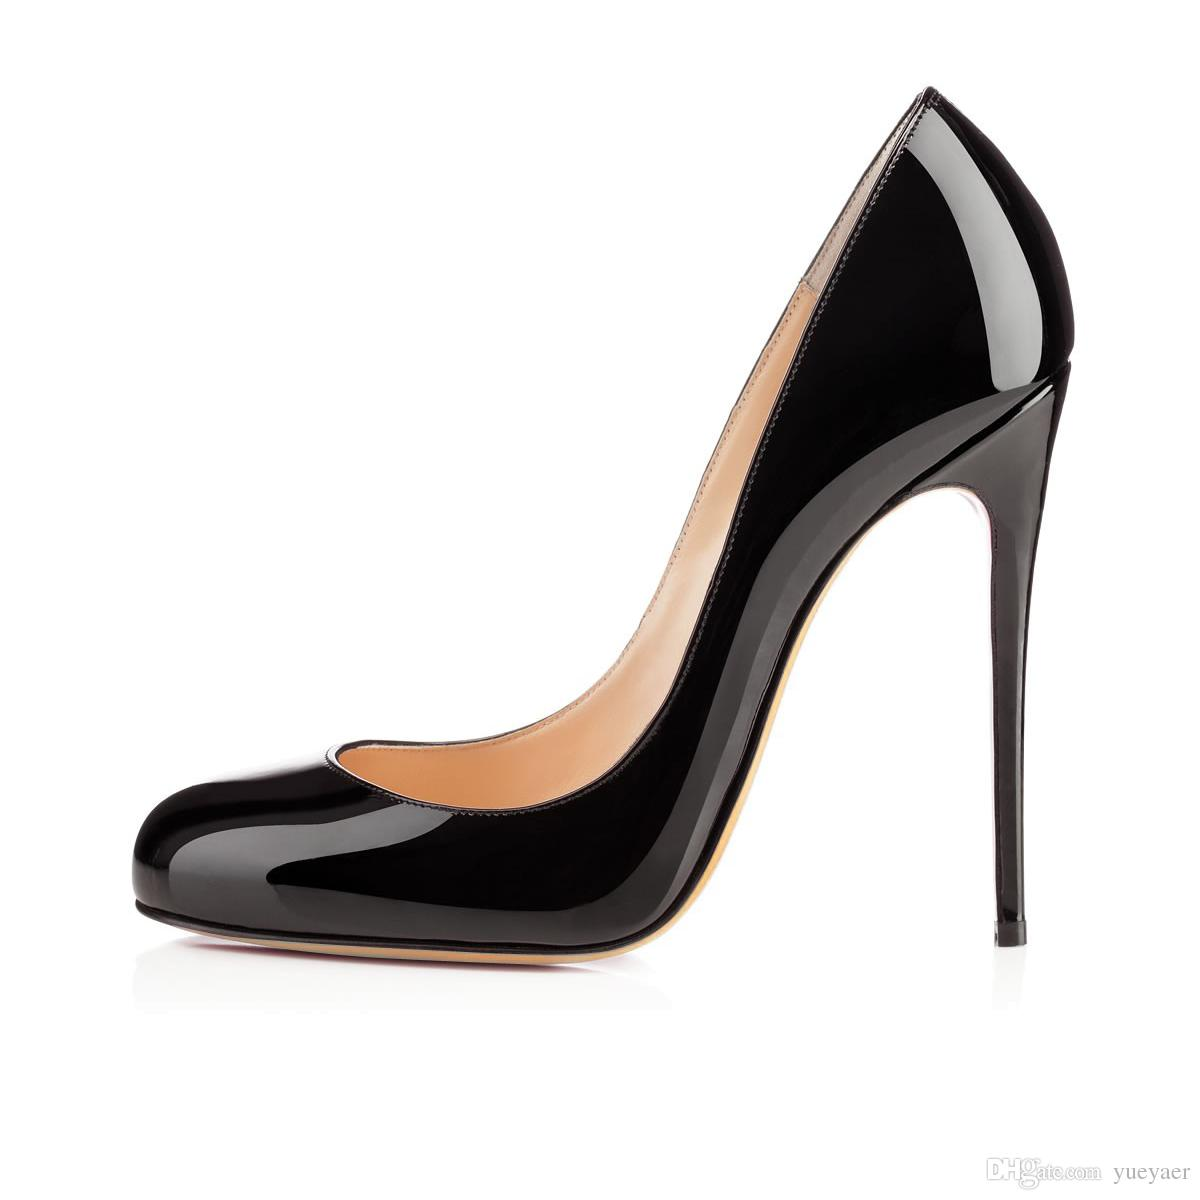 9d5dda3c87783 Zandina Ladies Handmade Fashion Feifei 120MM Sky Slim Heel Slip On ...